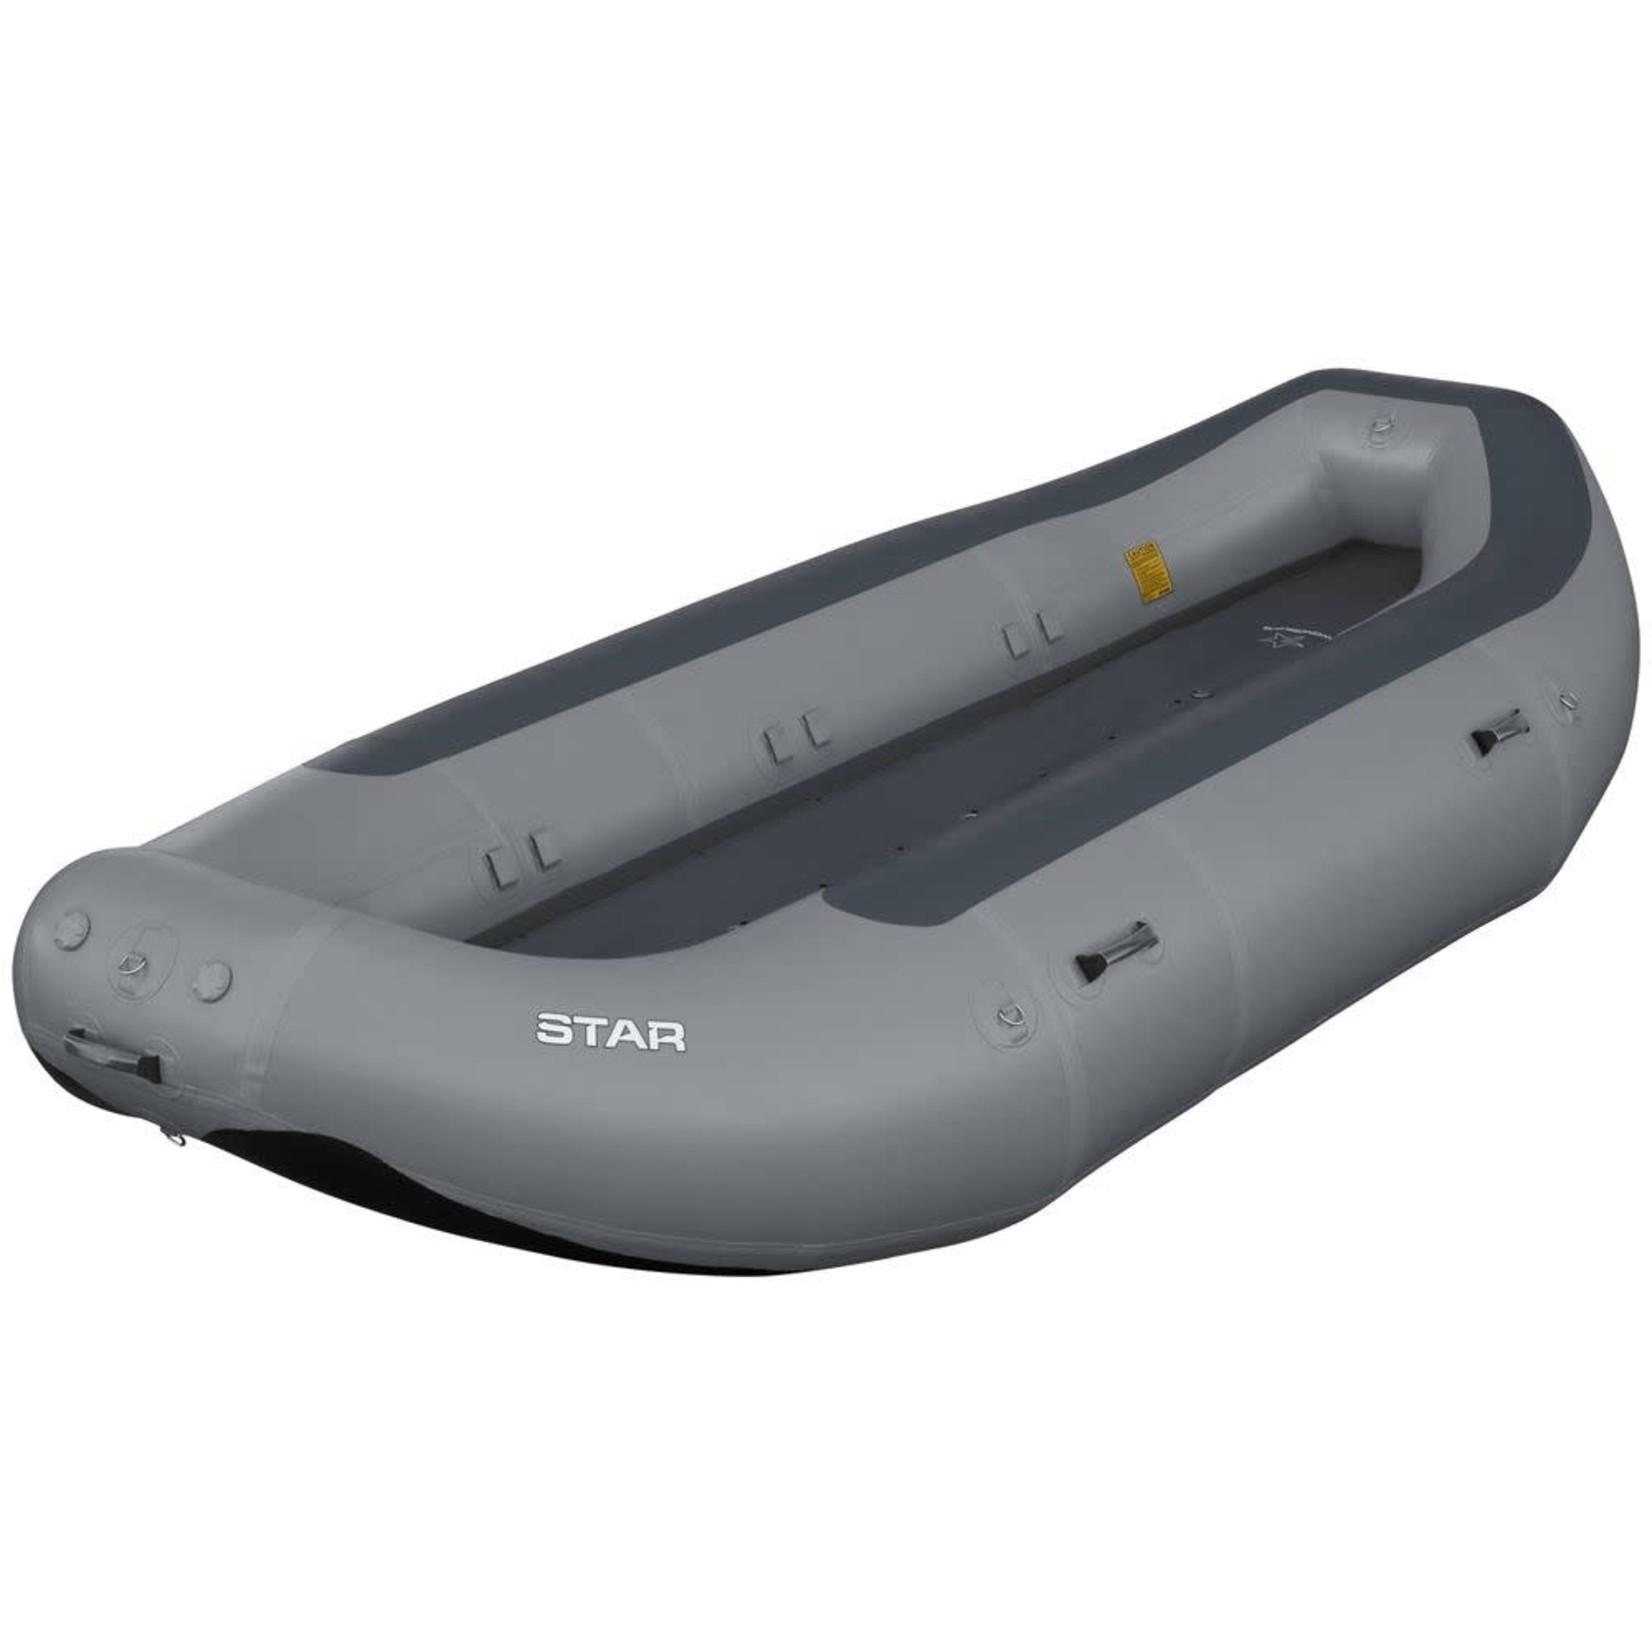 STAR STAR Wonder Bug Self-Bailing Raft